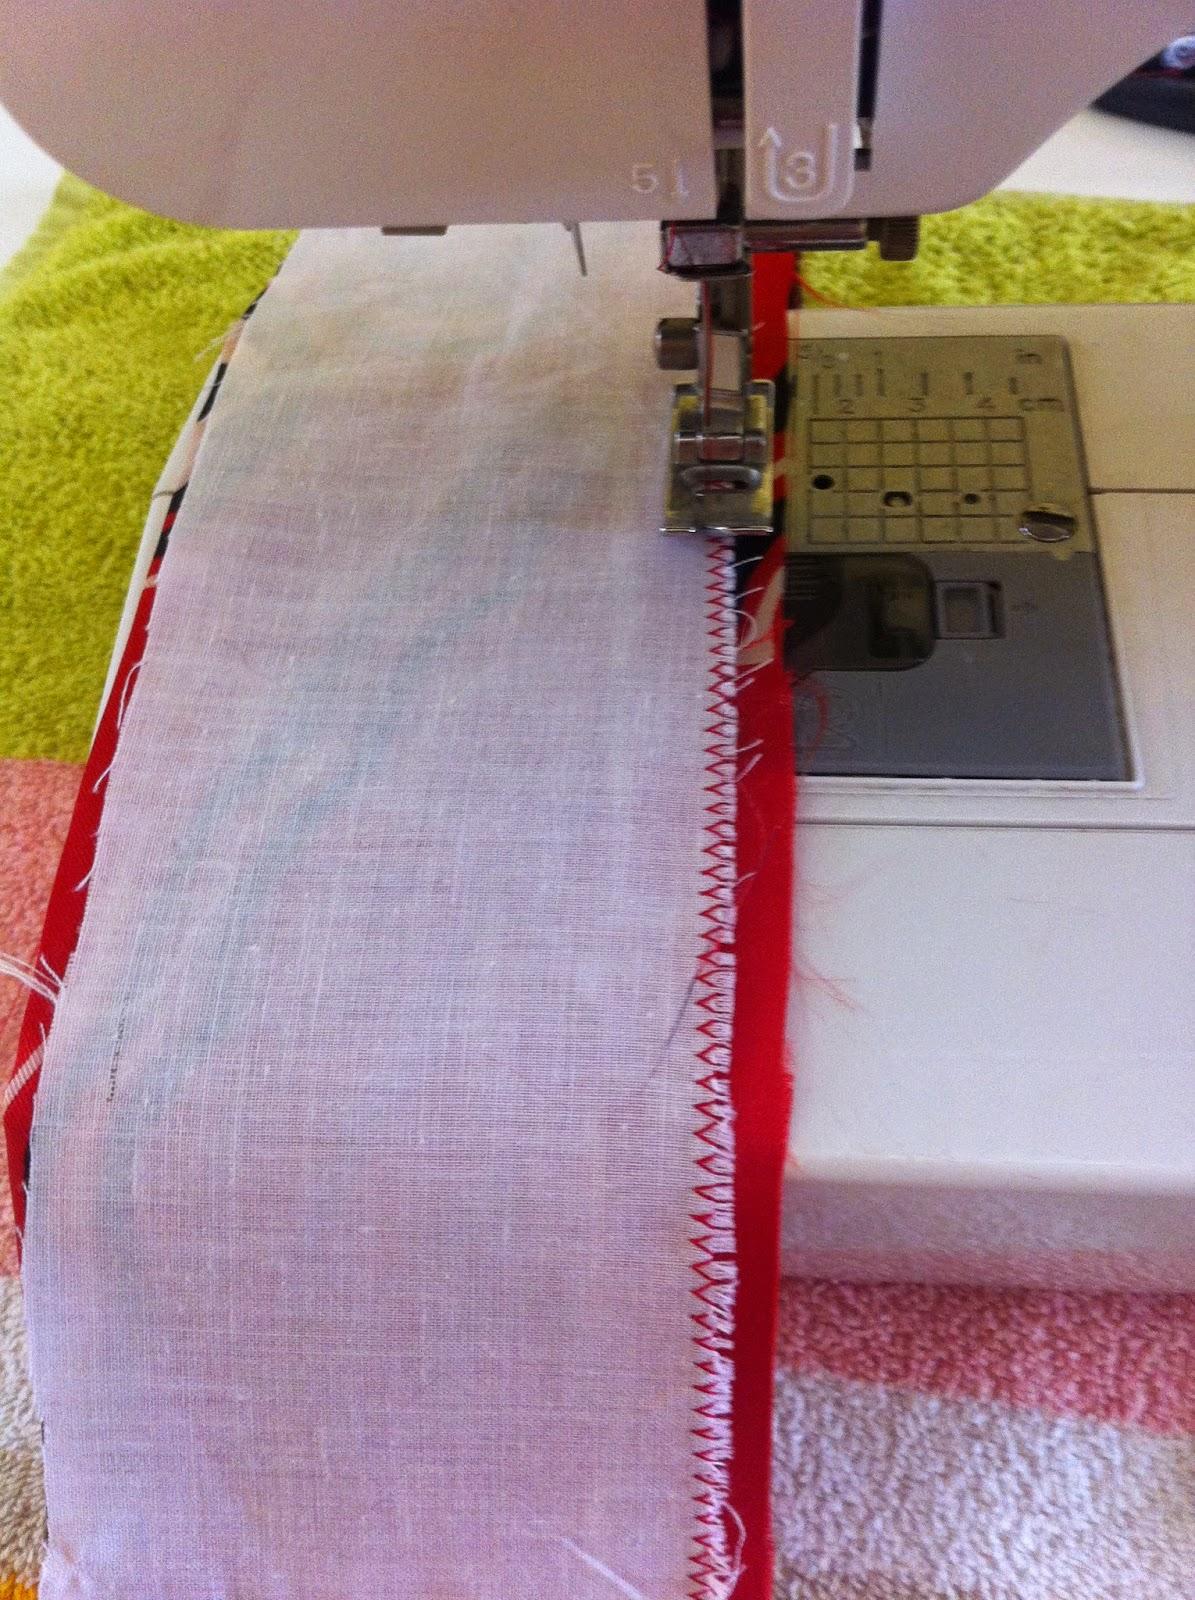 white hermes birkin bag - The PseudoShrink: DIY Herm��s Twilly-Style Scarves